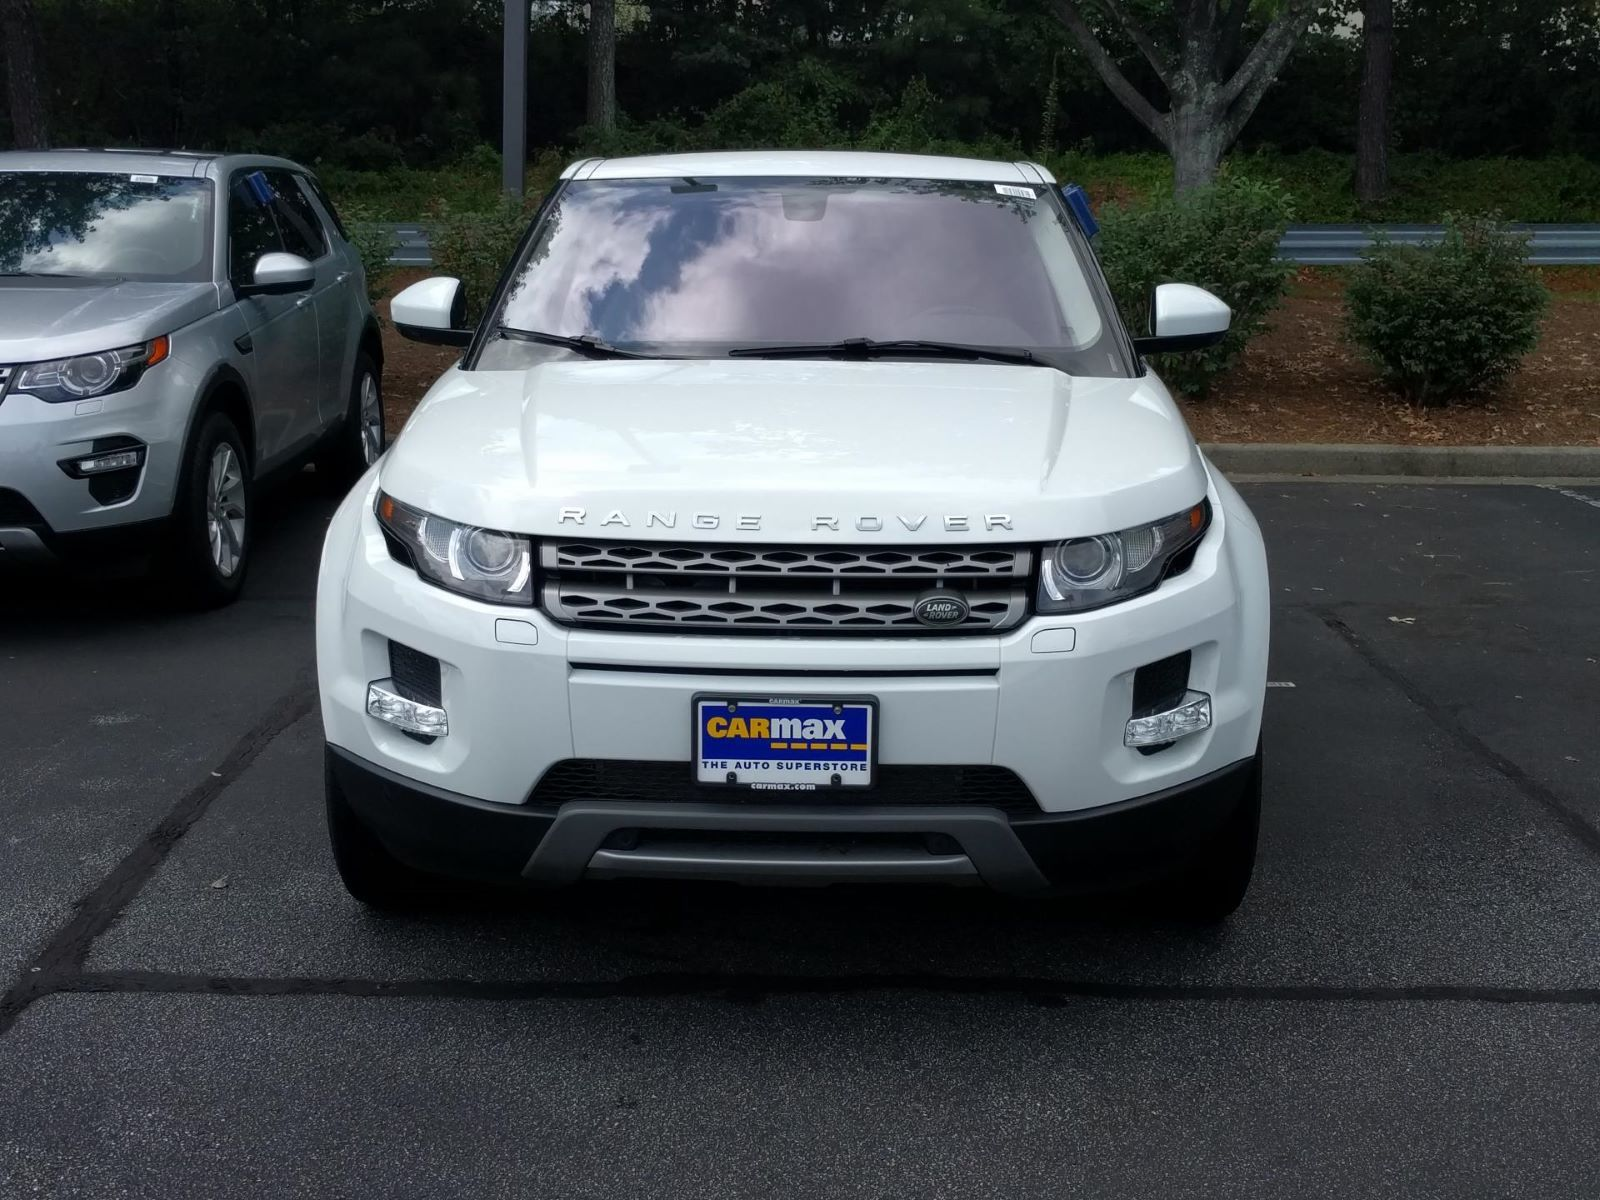 Used 2014 Land Rover LR2 in San Antonio Texas CarMax